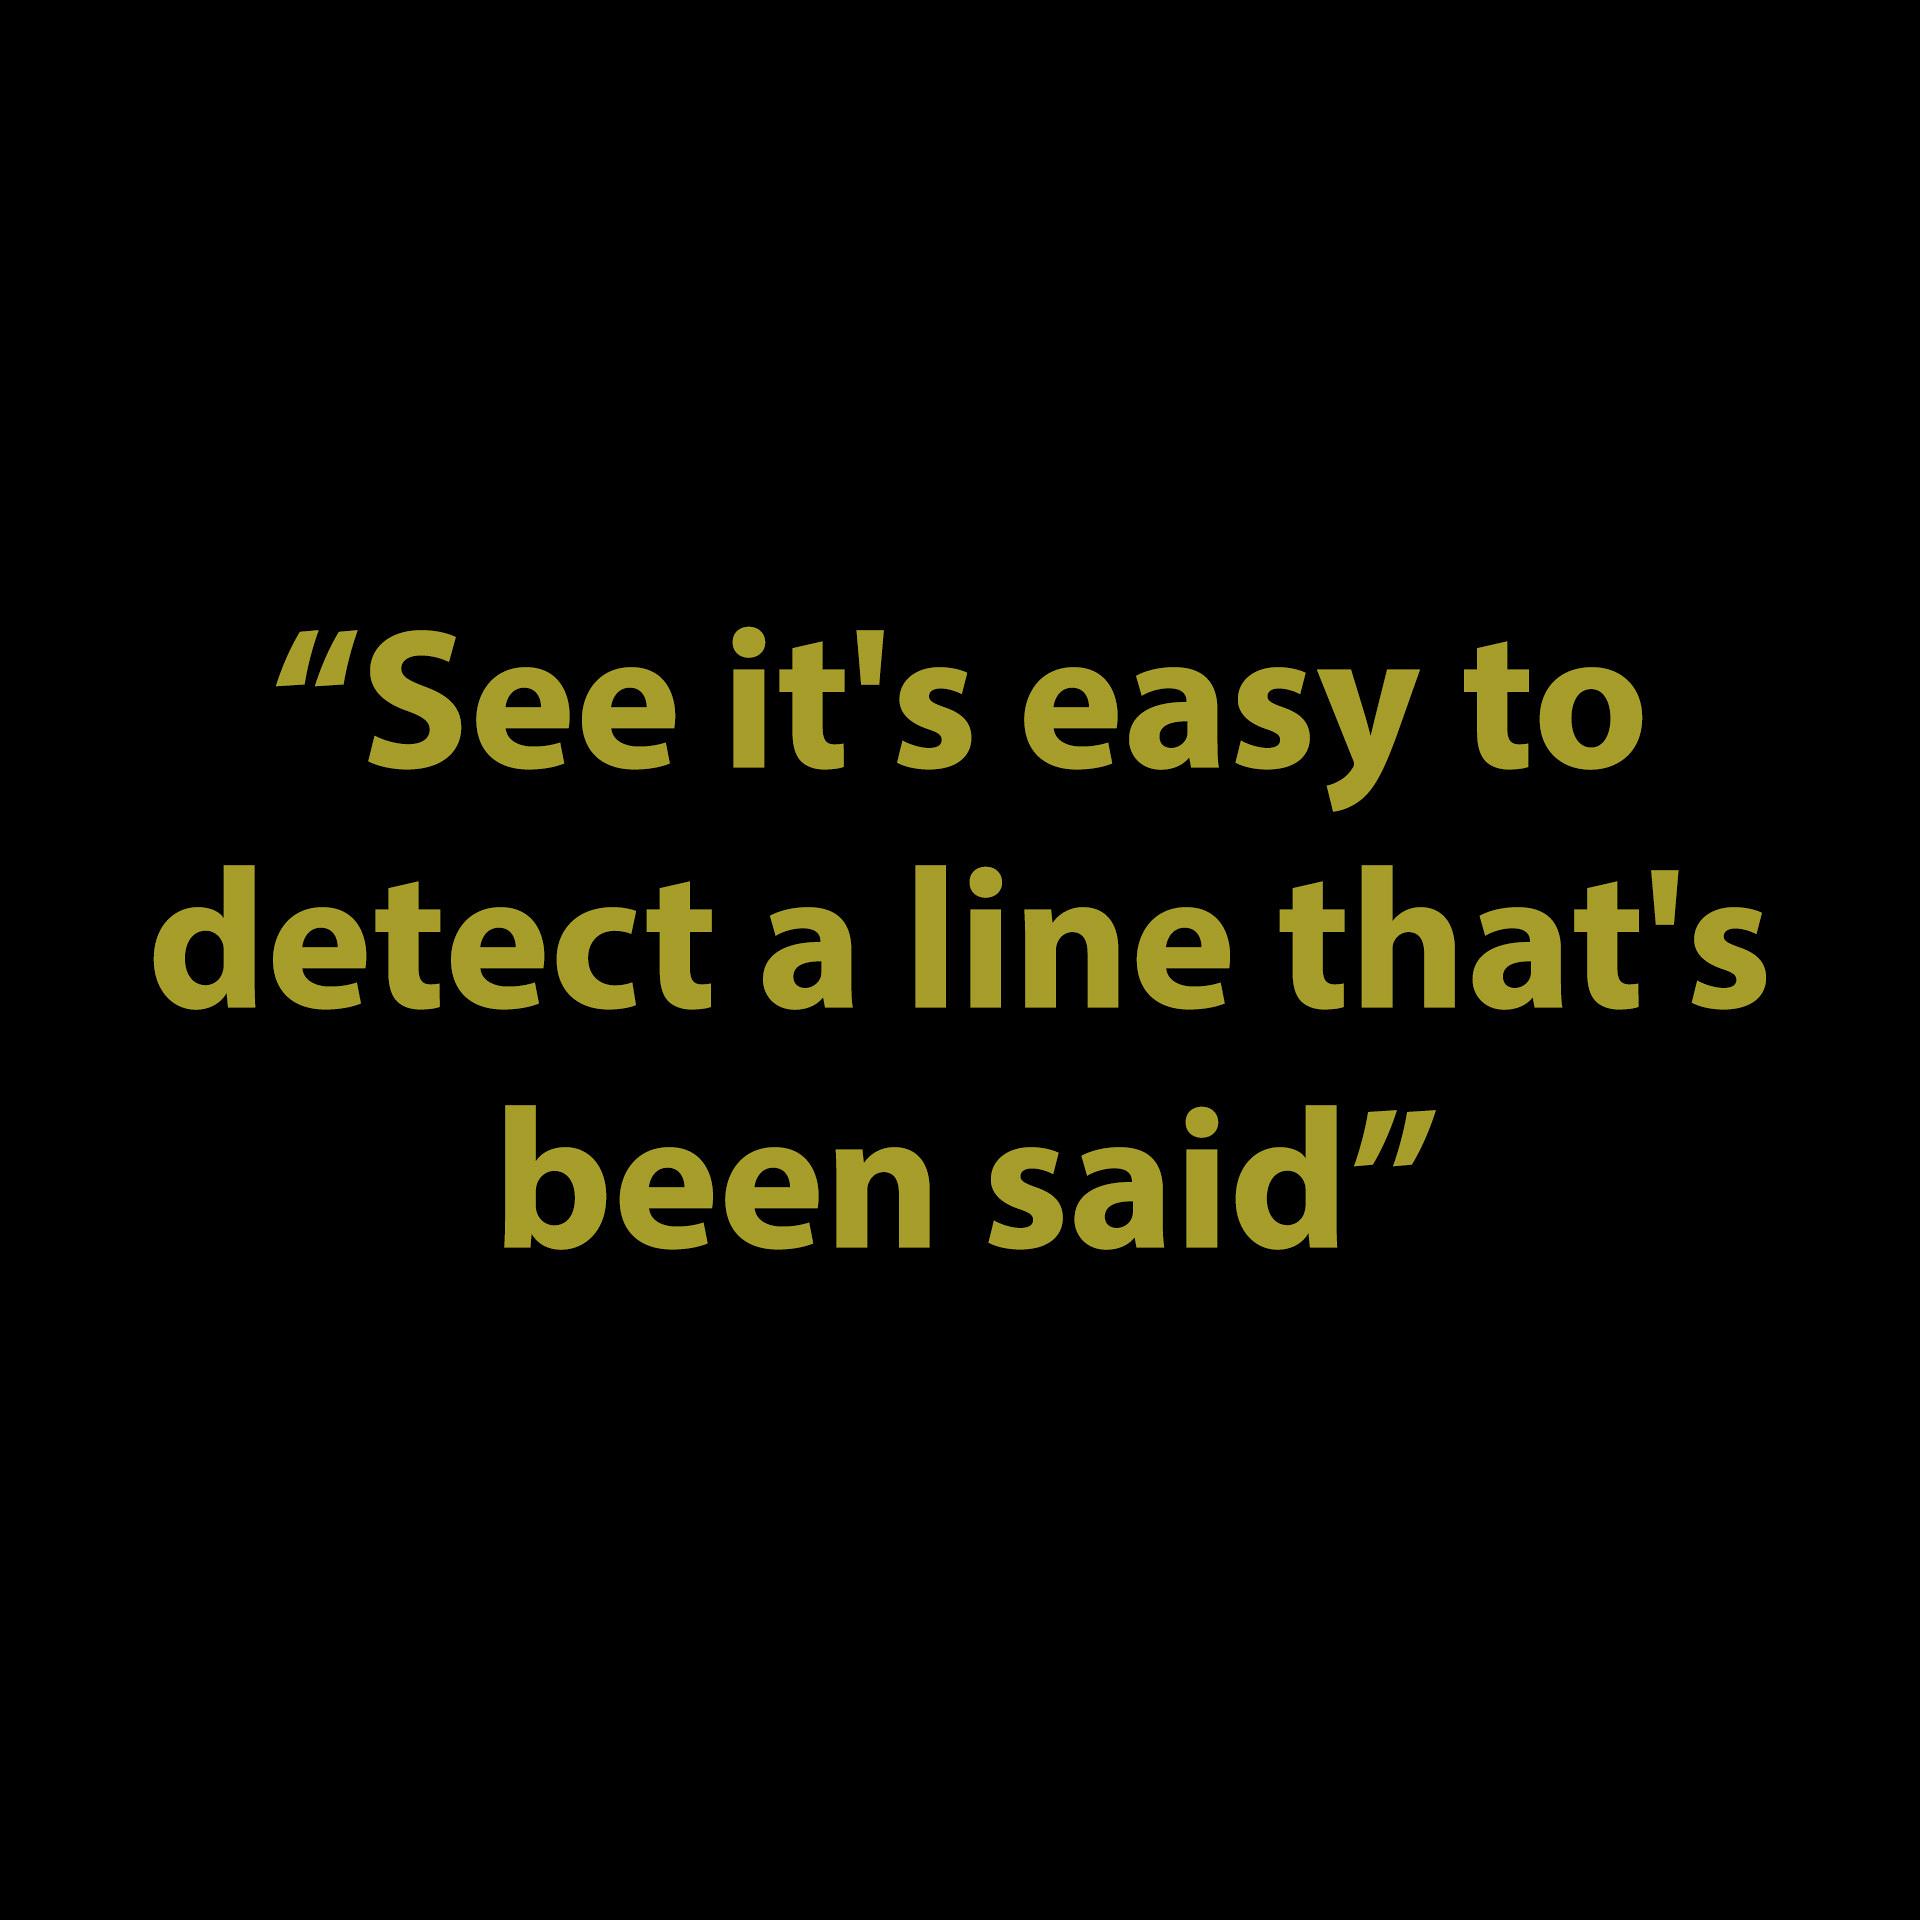 LYRIC OR LINE?